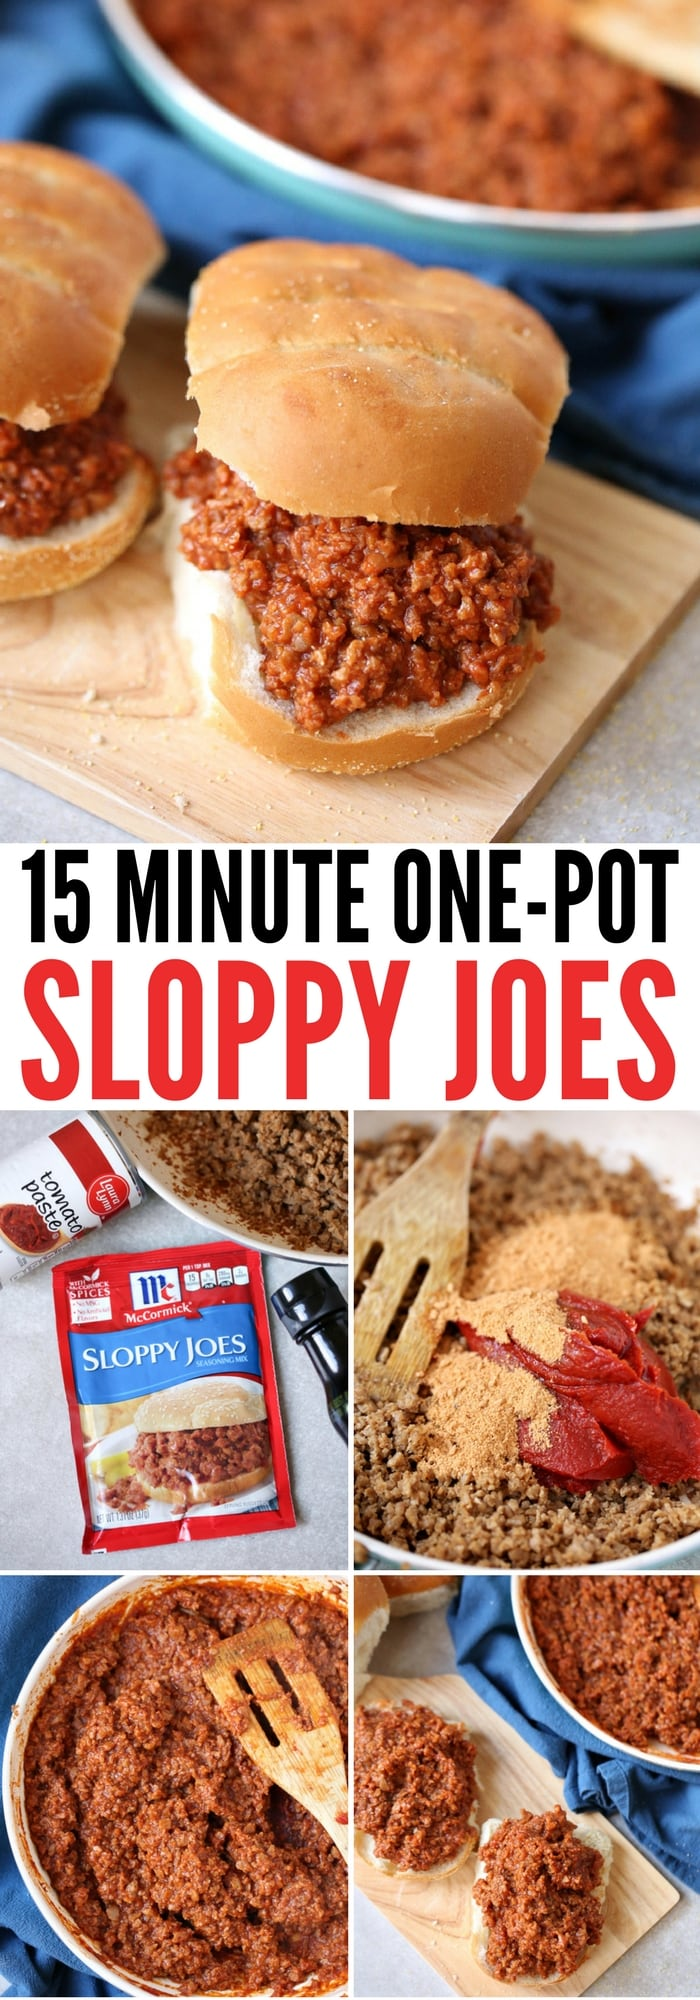 Pinterest image for quick and easy one pot sloppy joe recipe.